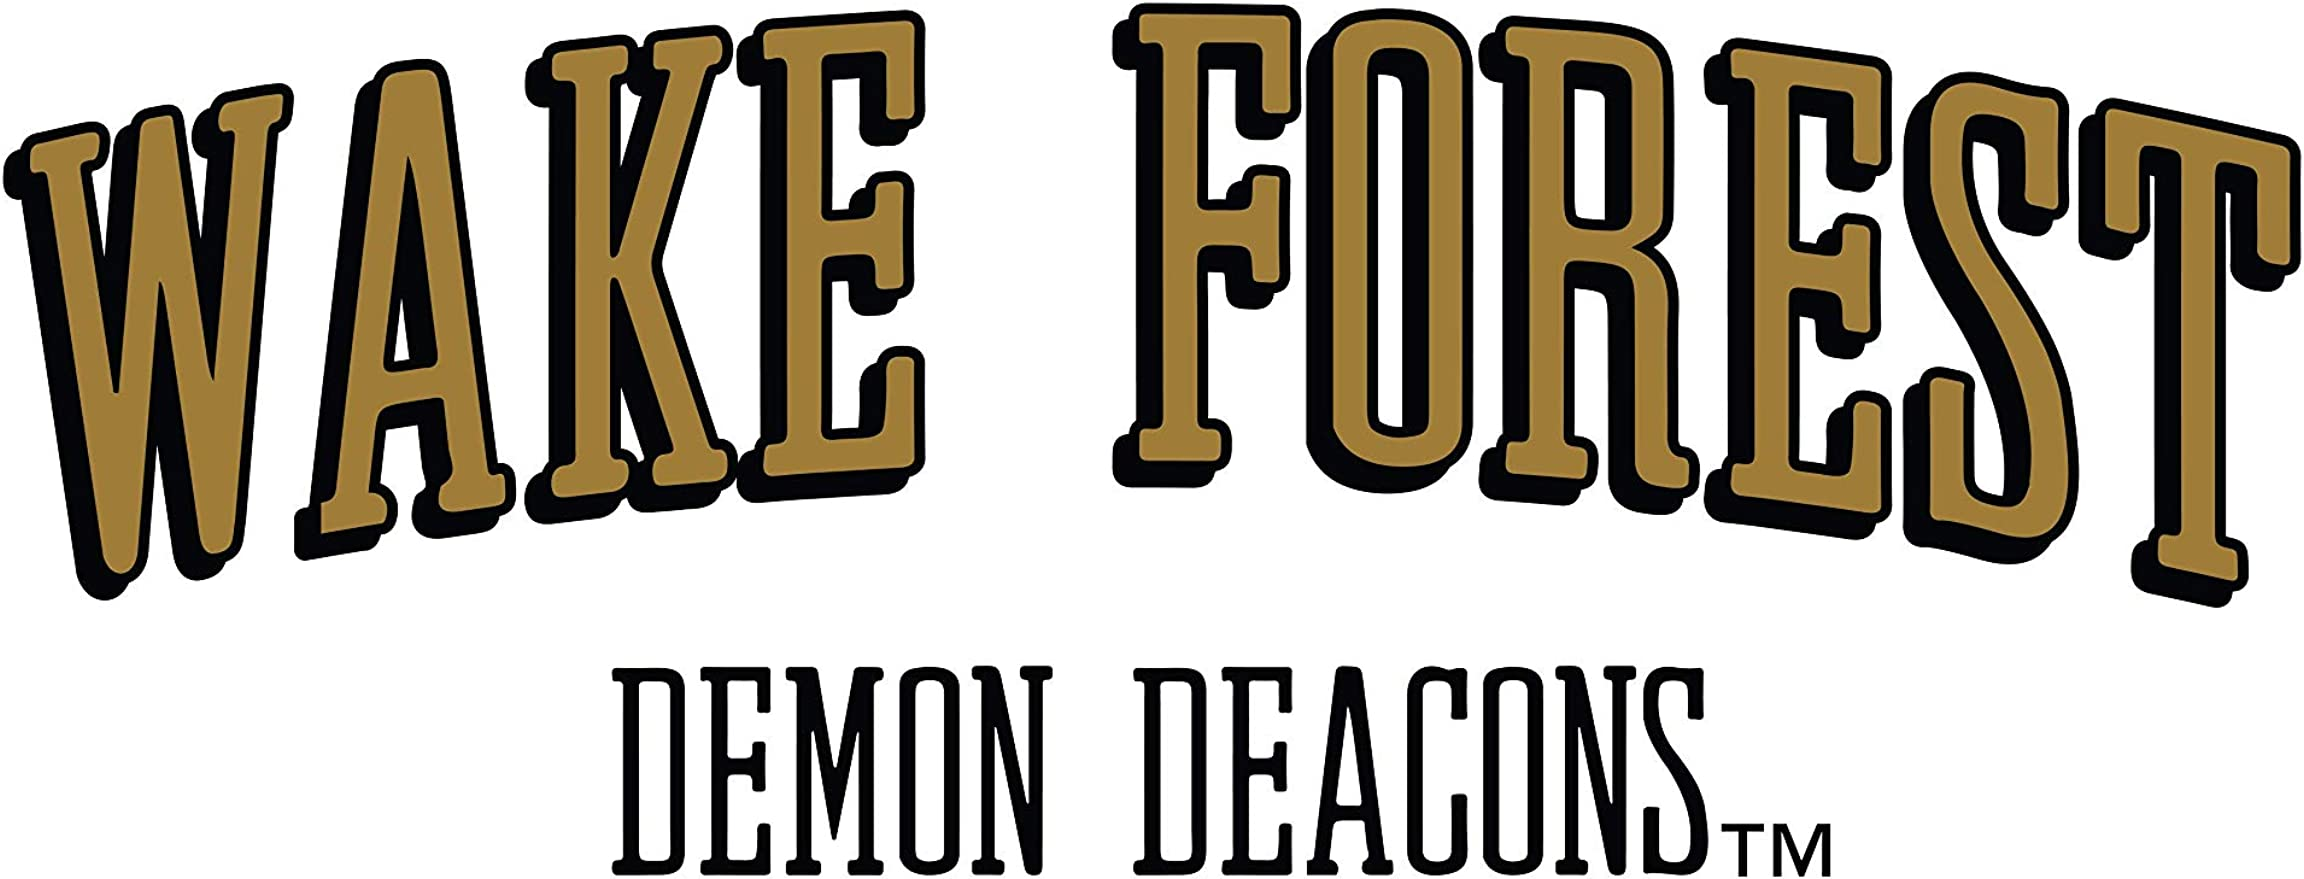 RYLWF06 Mens//Womens Boyfriend Sweatshirt Official NCAA Wake Forest Deacons